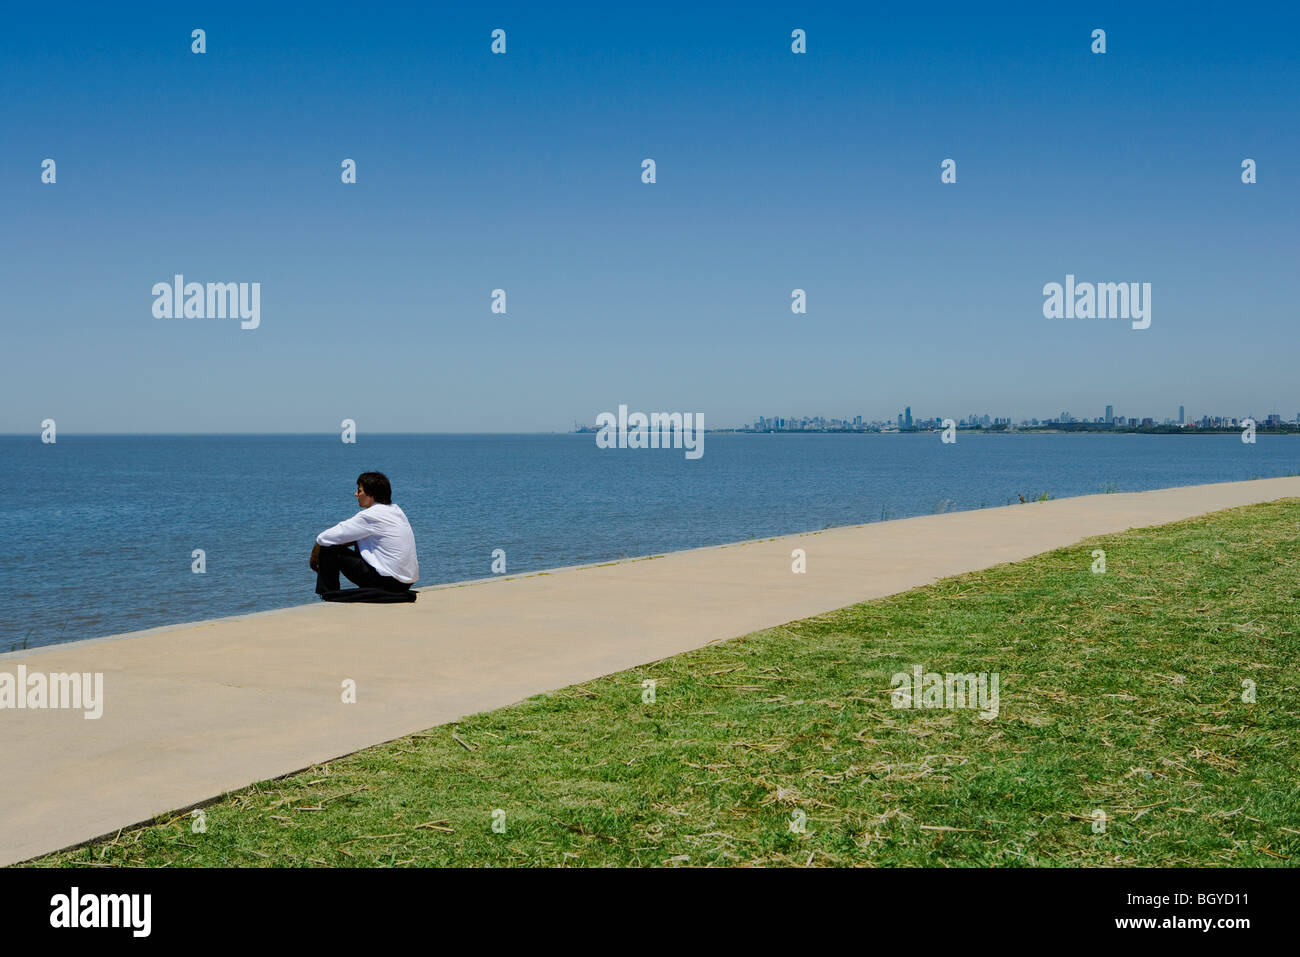 Man sitting beside sea, looking toward horizon - Stock Image